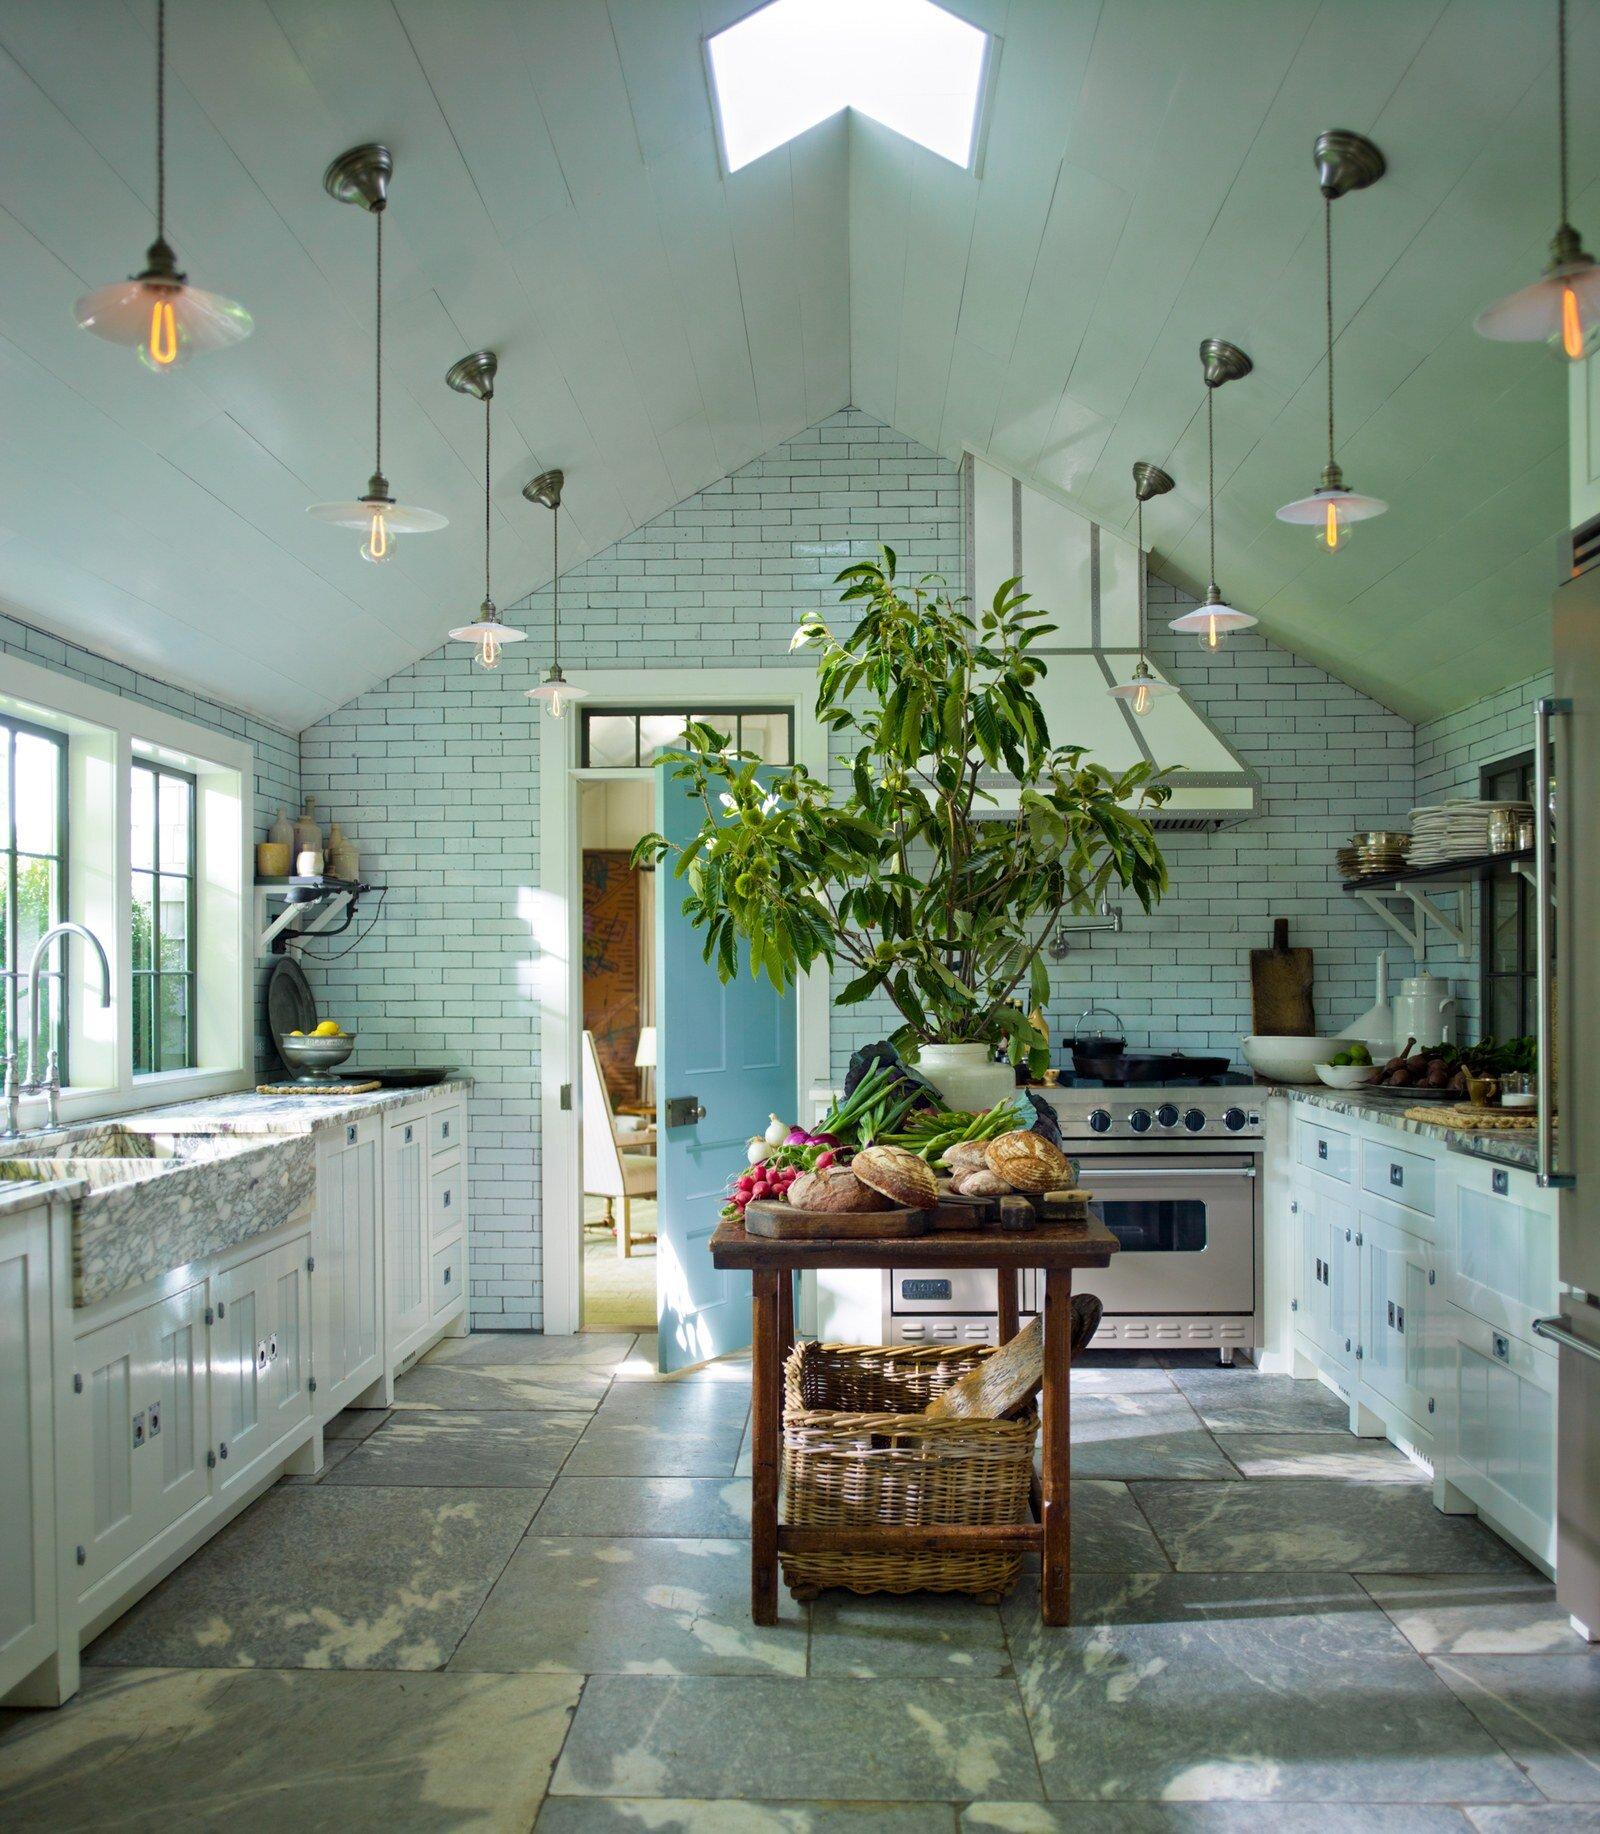 steven-gambrel-kitchen-designs-01.jpg